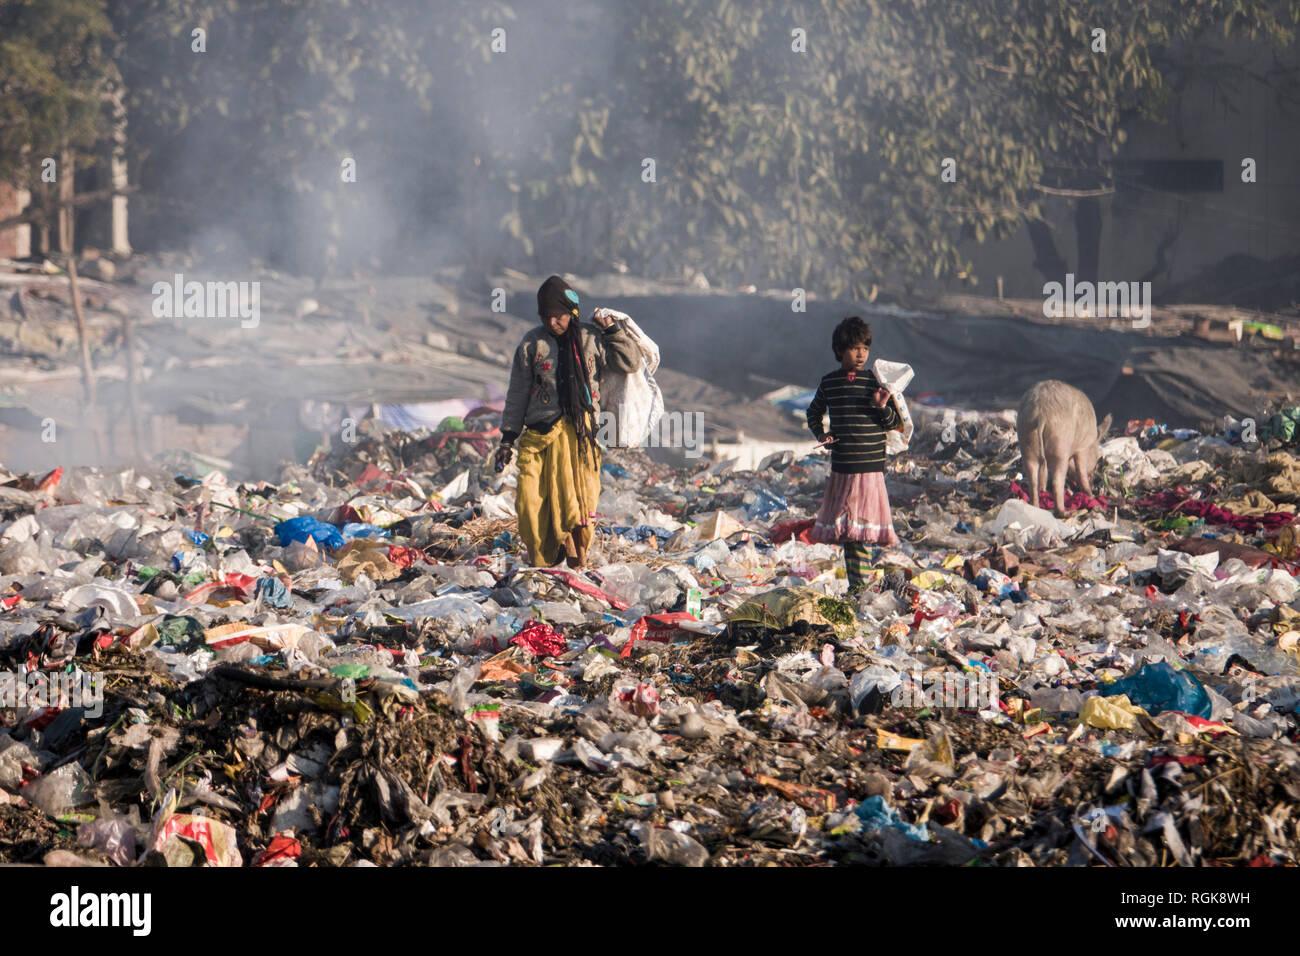 Family of ragpickers rummaging through trash at dumping ground in Rishikesh, Uttarakhand, India - Stock Image